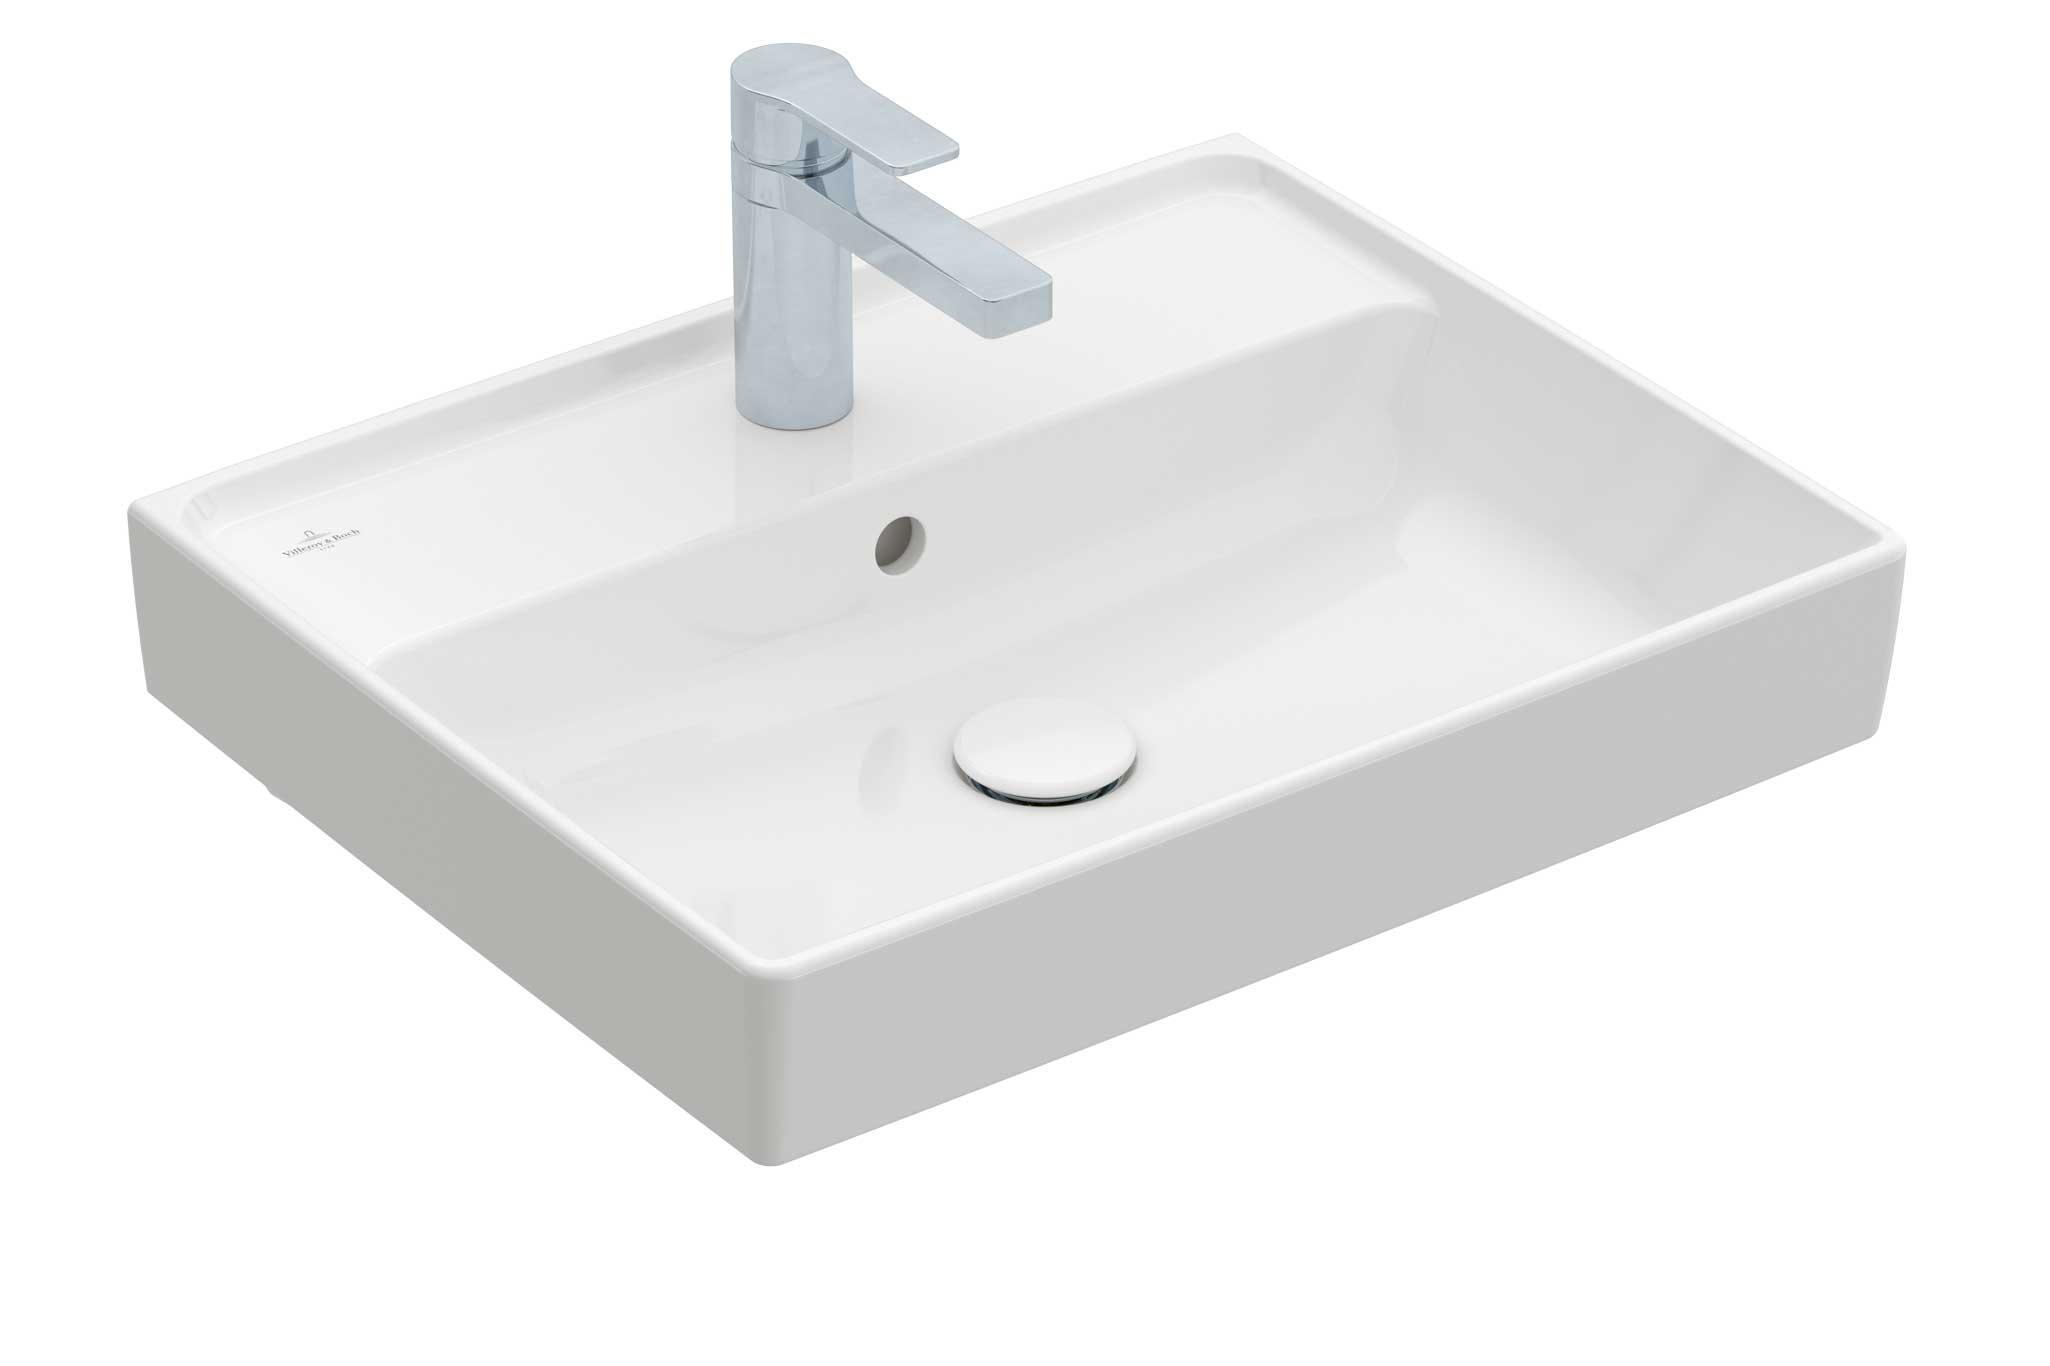 Waschbecken Villeroy & Boch